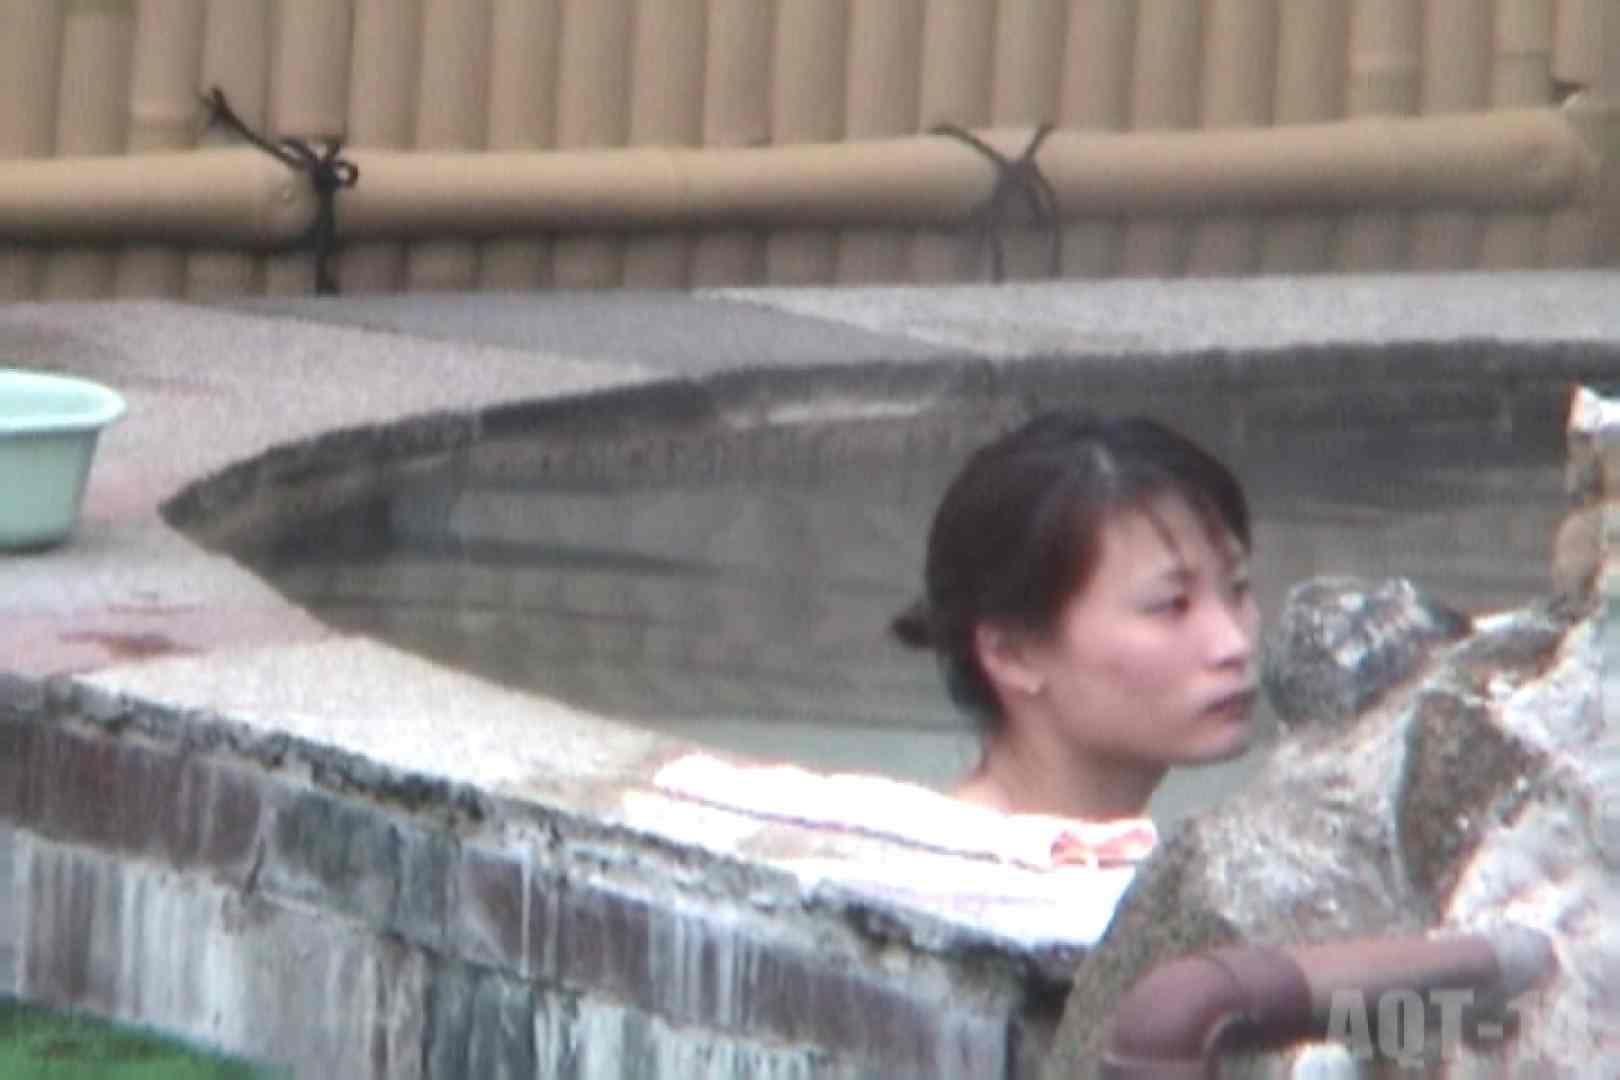 Aquaな露天風呂Vol.822 盗撮師作品 SEX無修正画像 75pic 32